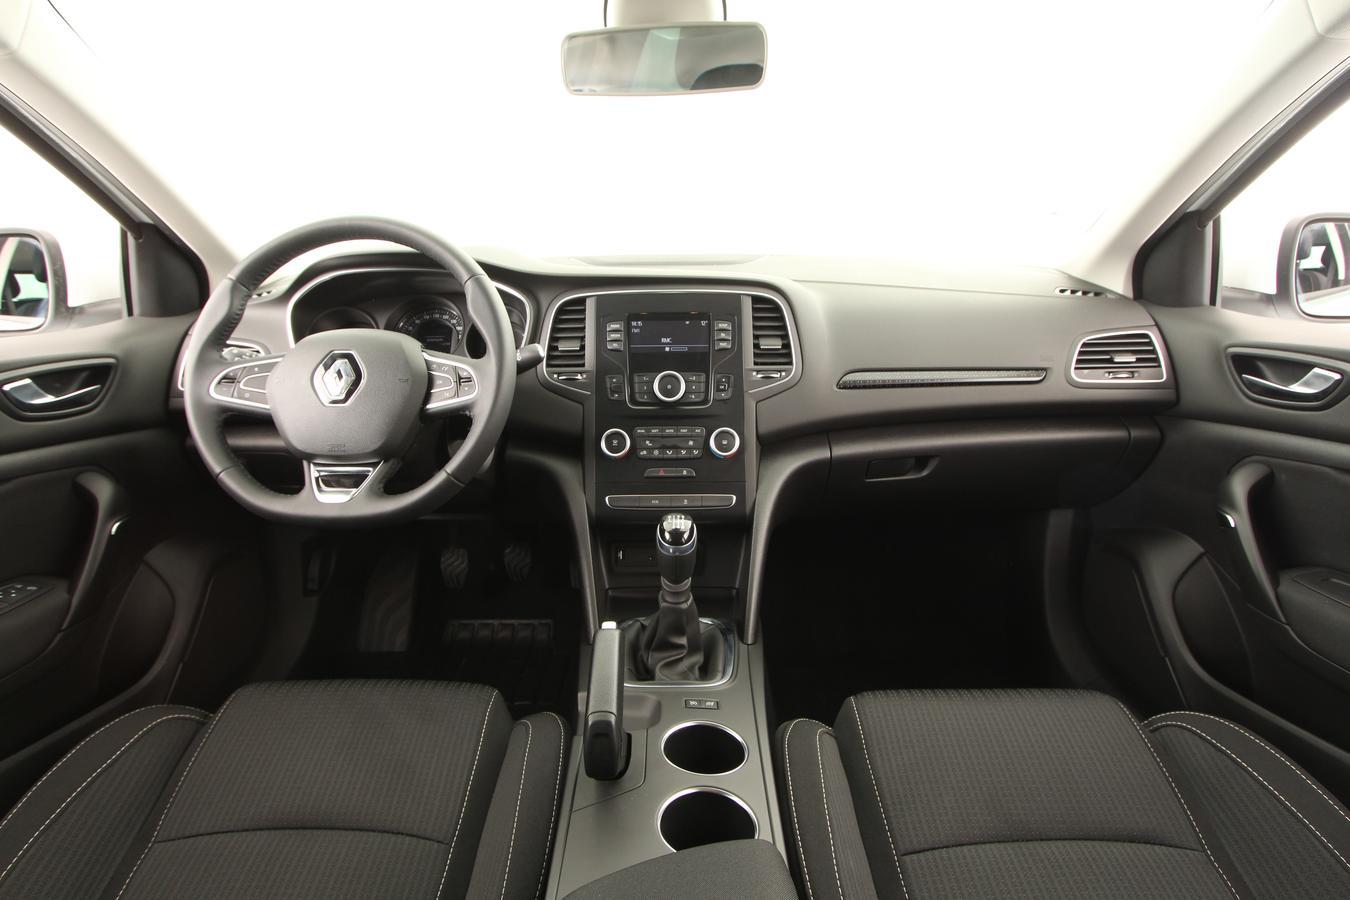 renault m gane 4 berline compacte 5 portes essence tce 100 bo te manuelle finition. Black Bedroom Furniture Sets. Home Design Ideas